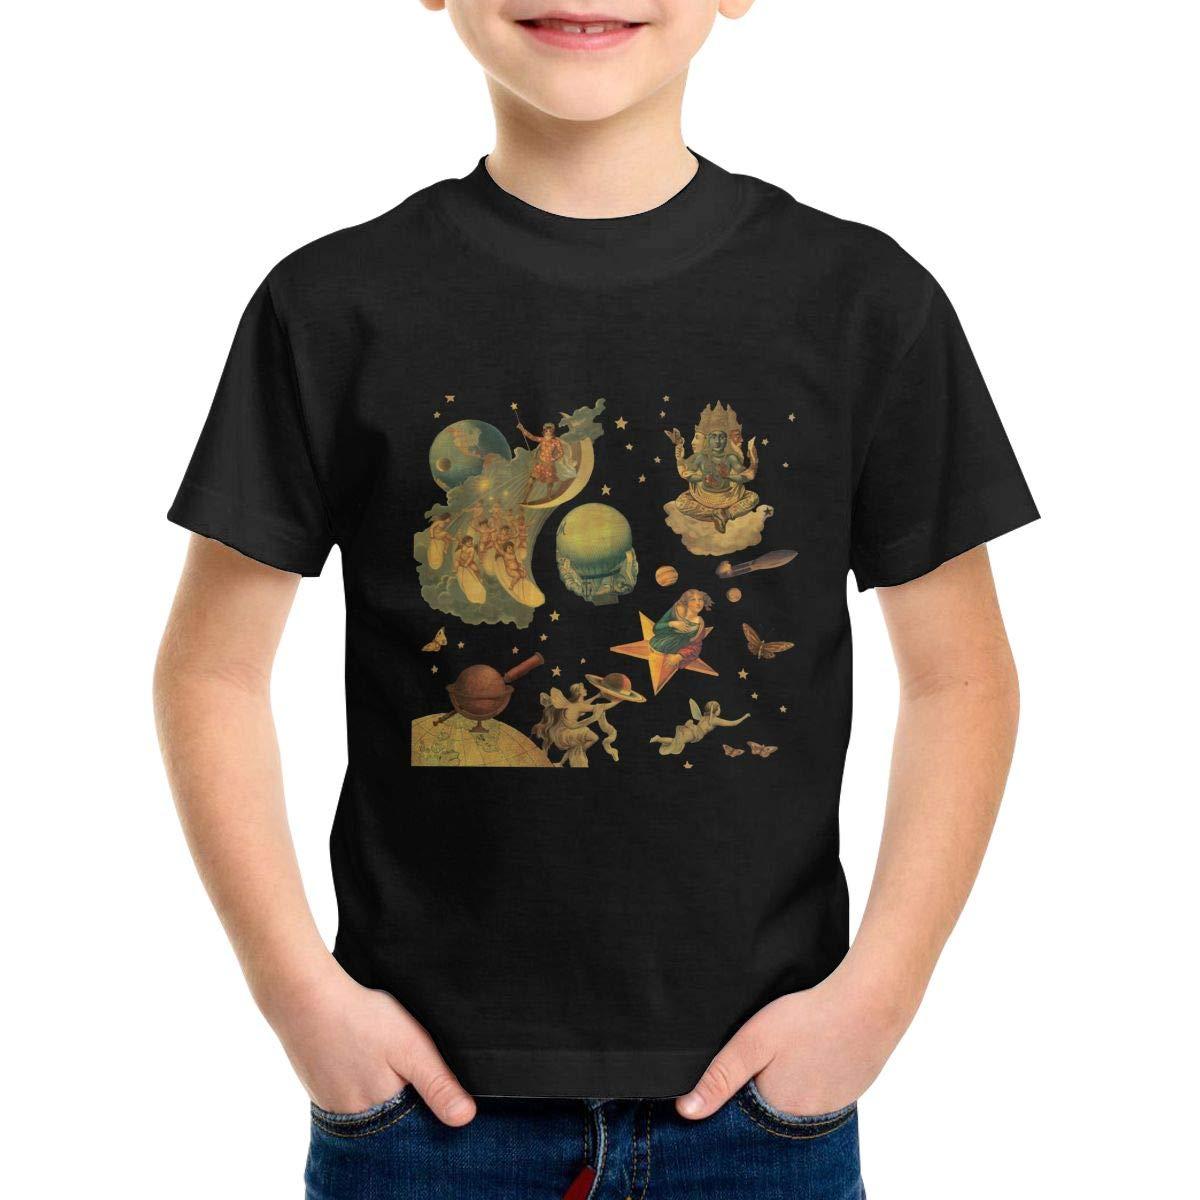 Smashing Pumpkins Mellon Unisex Girls Boys Kids Shirts